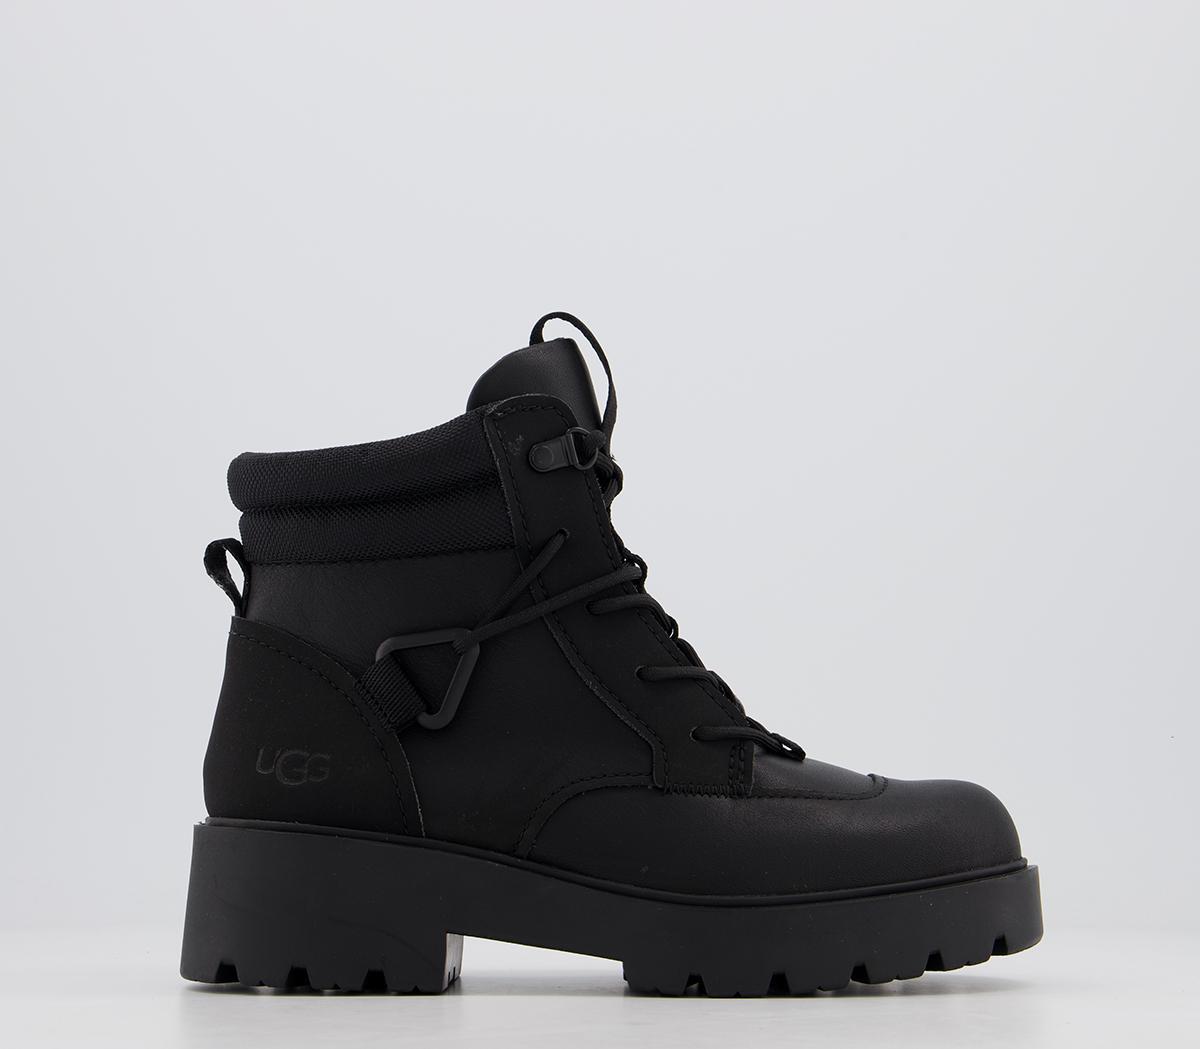 Tioga Boots